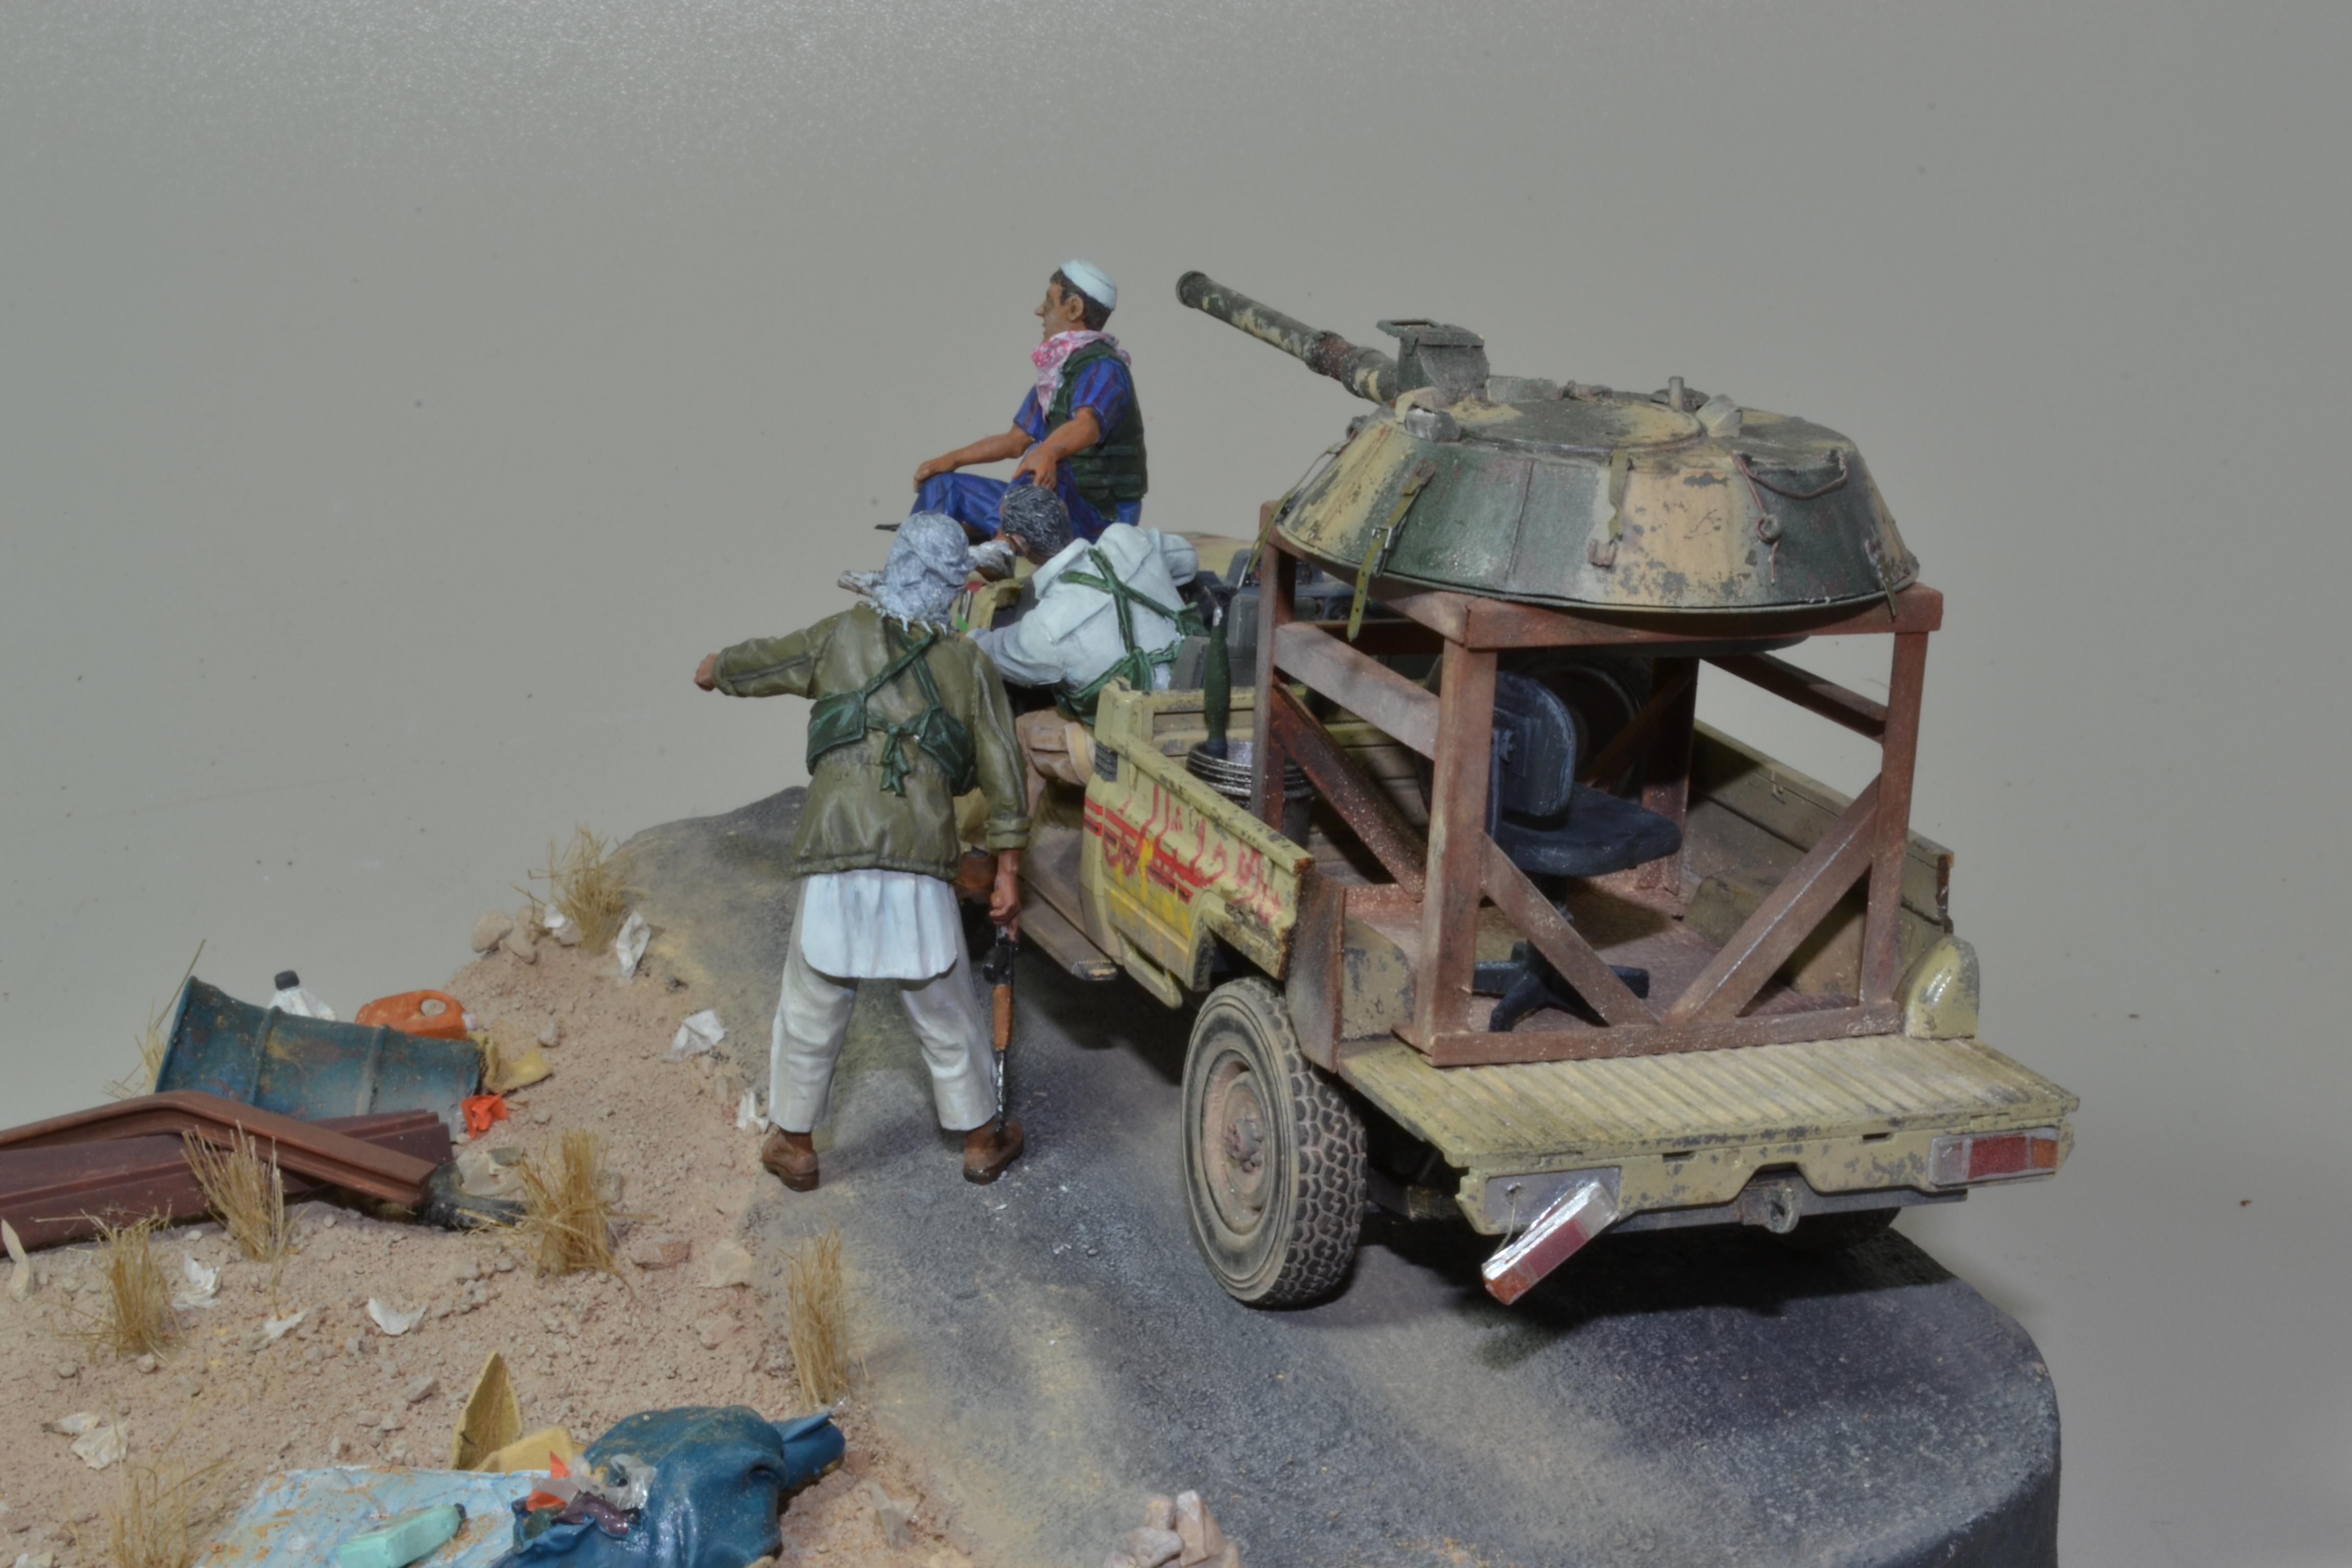 Pick-up (MENG)+tourelle BMP 1/35 (DEF model) - Page 4 16041810010915742614161000